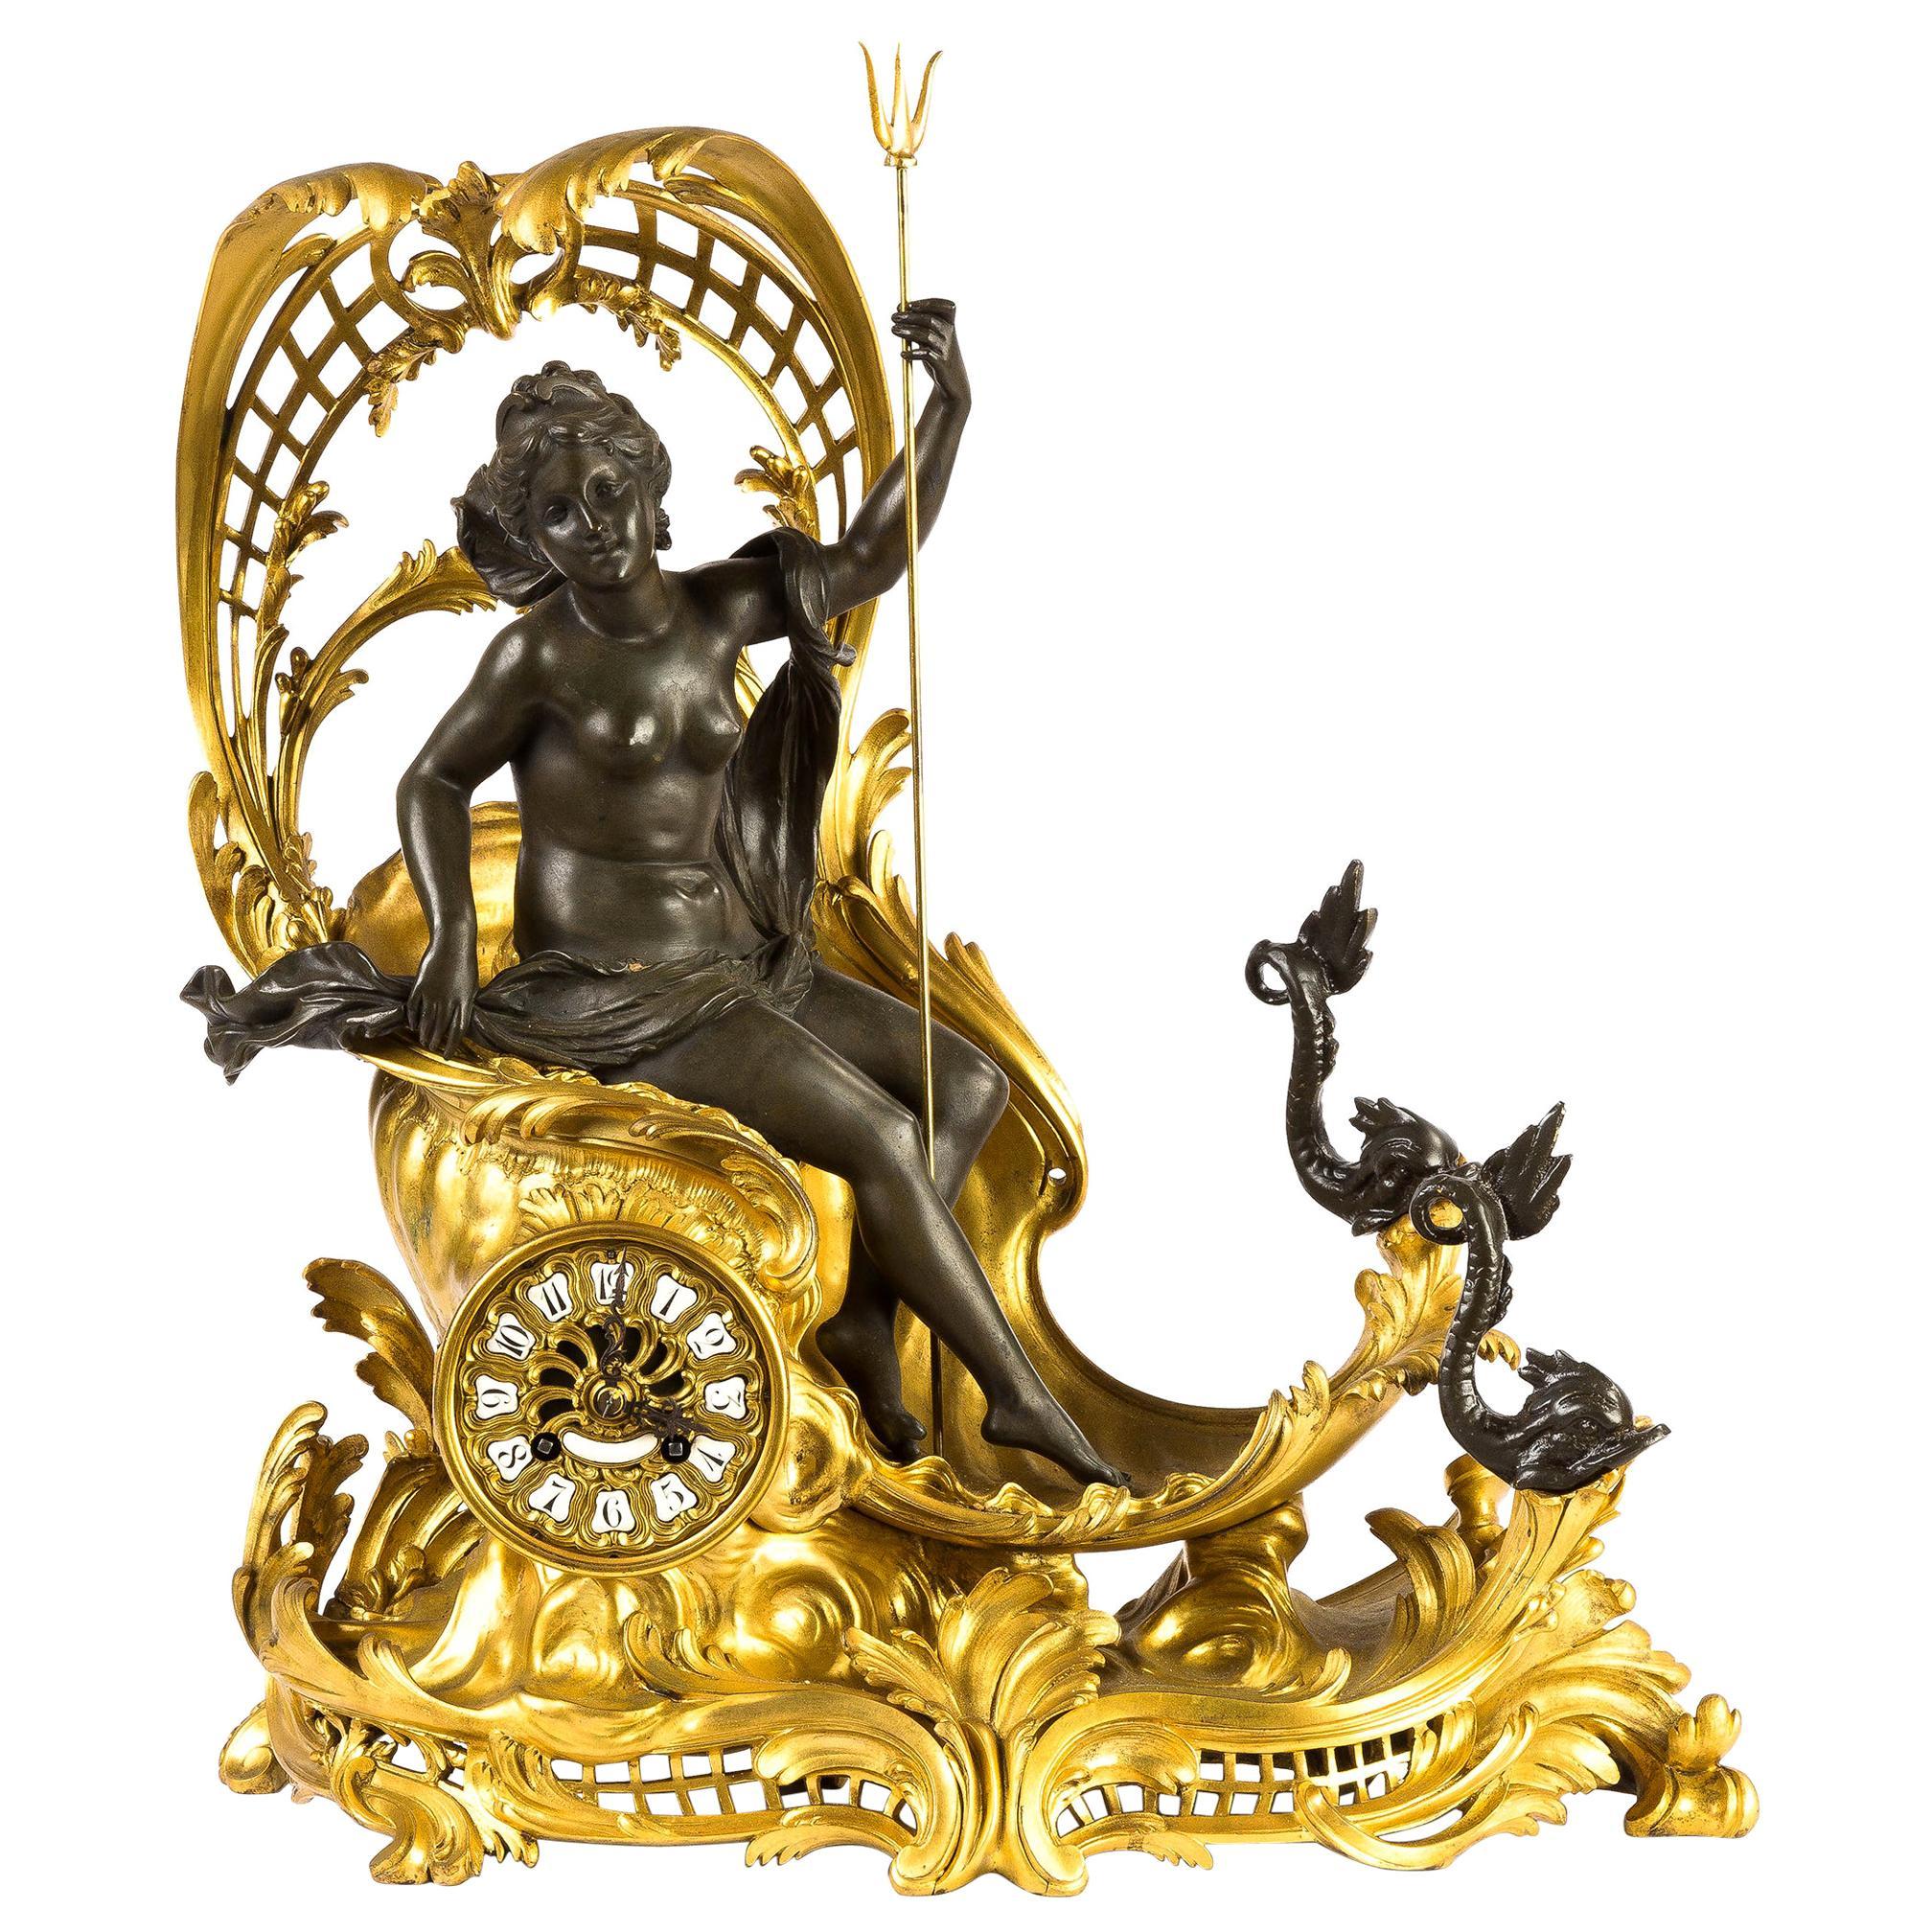 French Ormolu Figural Mantel Clock Depicting Amphitrite's Chariot